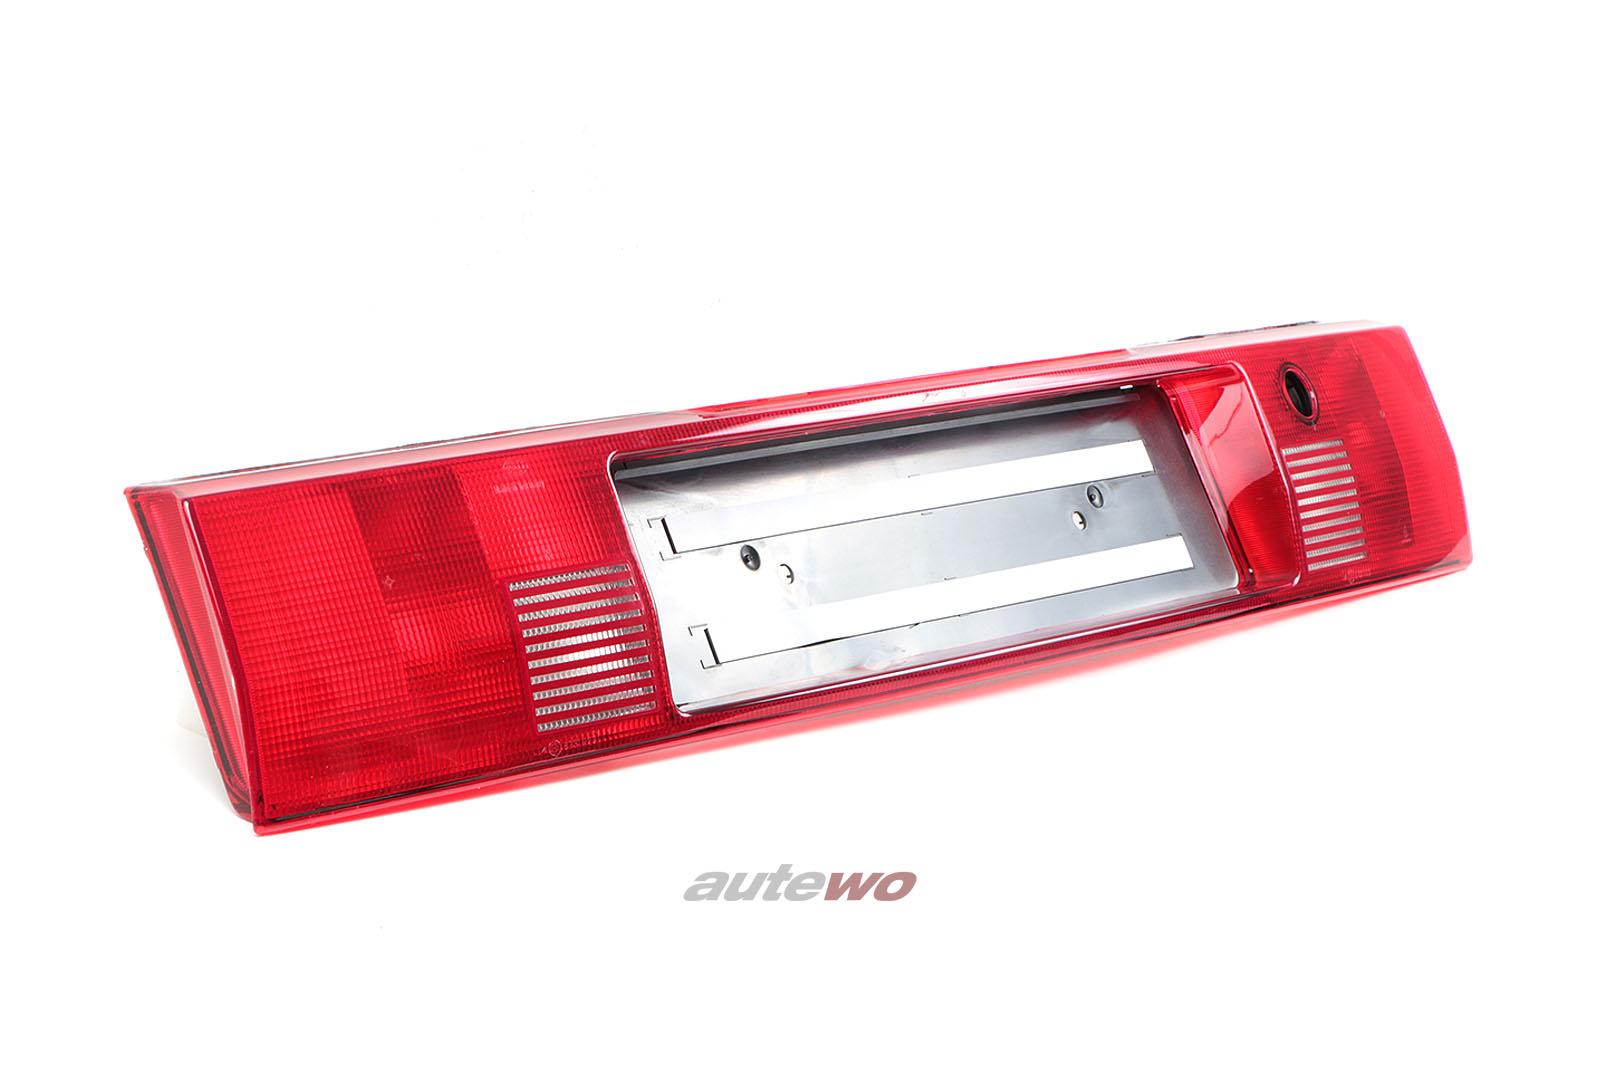 893945225E NEU&ORIGINAL Audi 80/90 Typ 89/B4 Rückleuchtenband/Kennzeichenblende